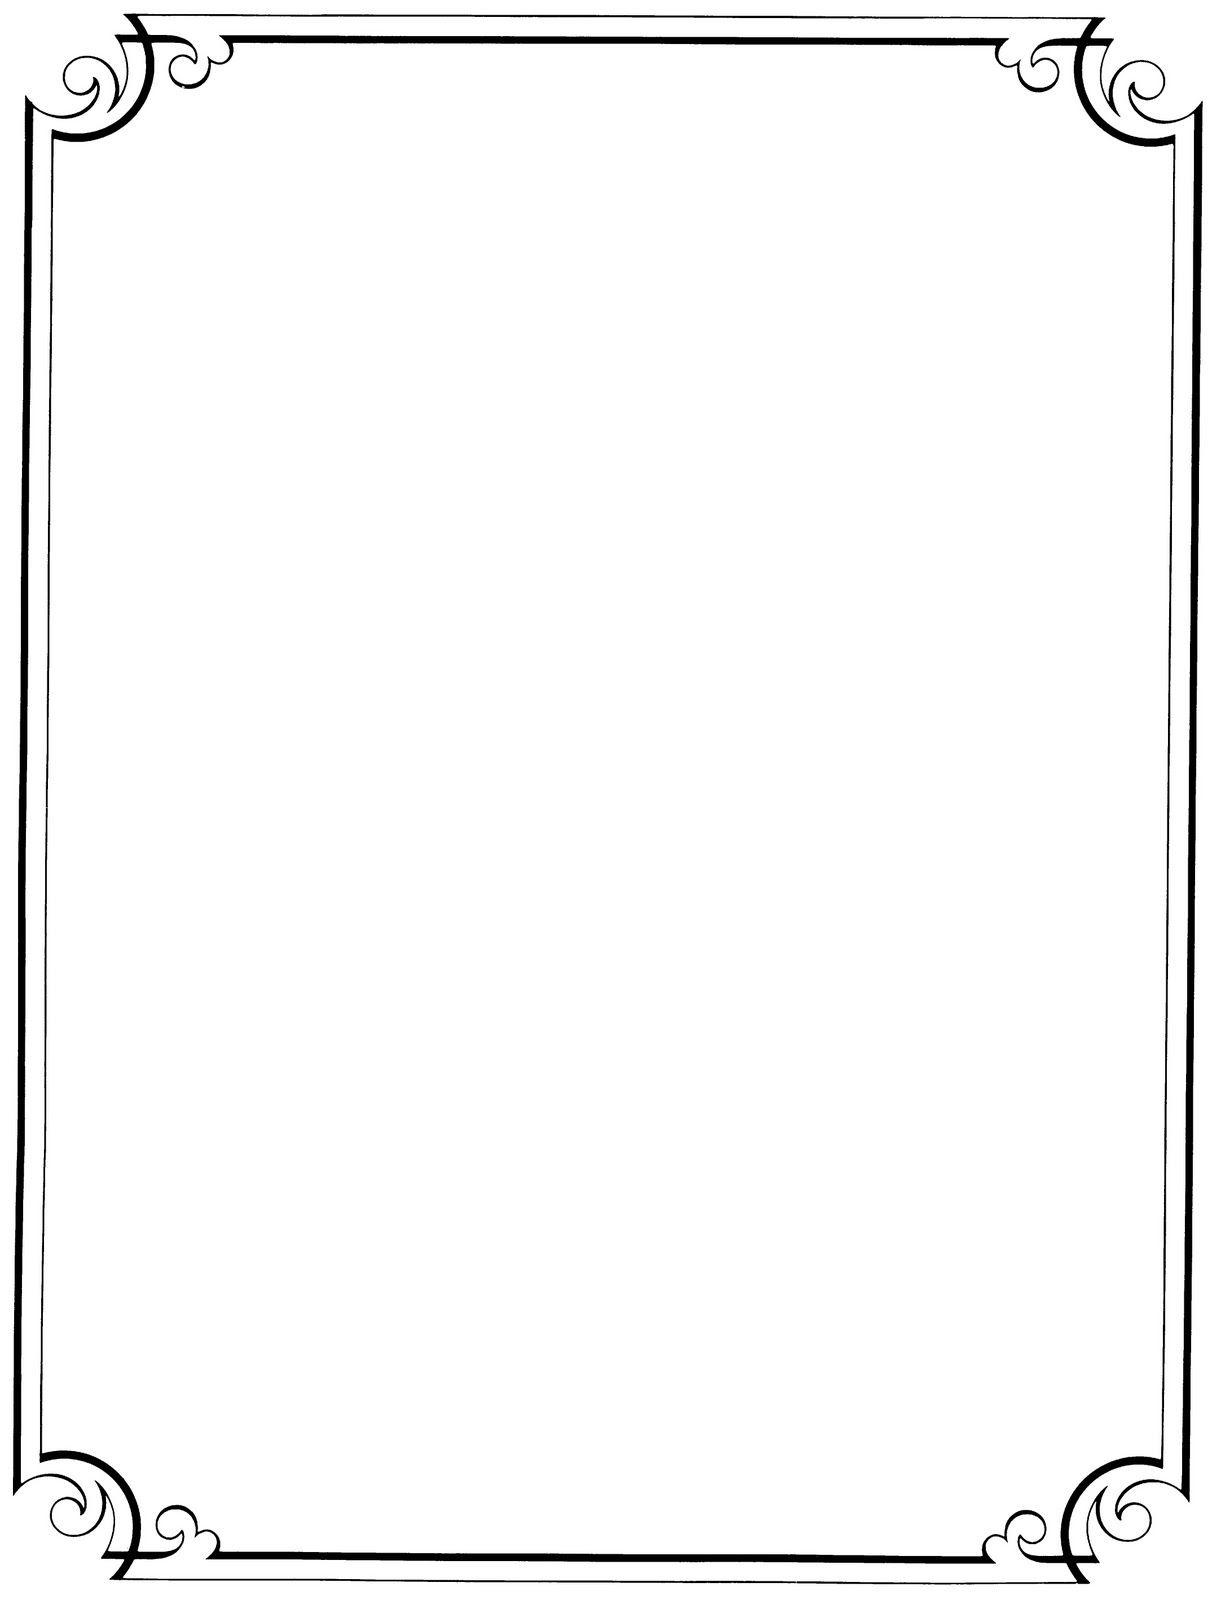 Free Printable Clip Art Borders |  : Free Vintage Clip Art - Free Printable Borders For Cards